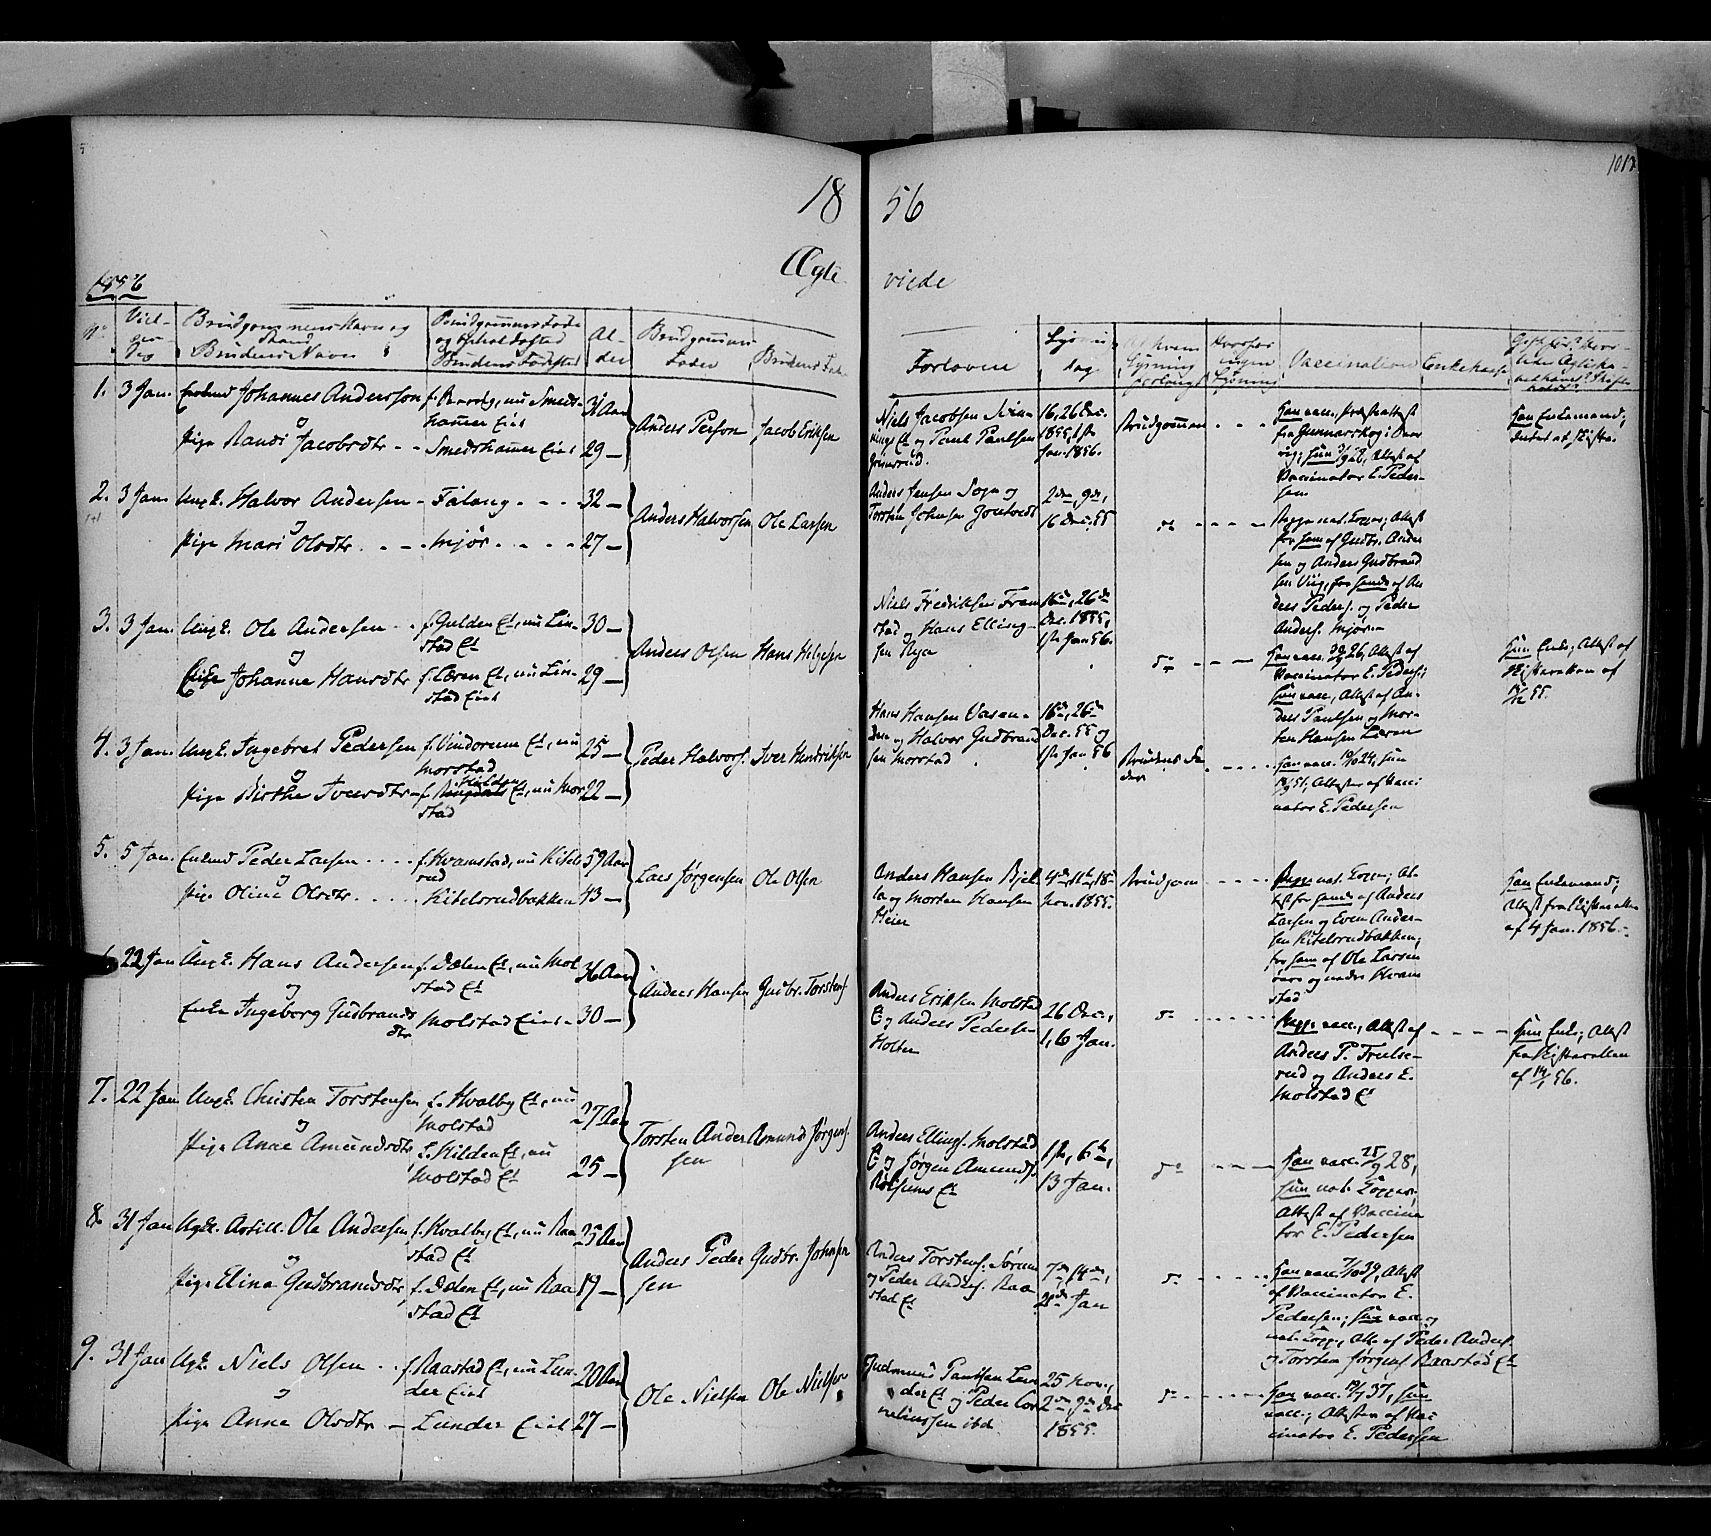 SAH, Gran prestekontor, Ministerialbok nr. 11, 1842-1856, s. 1012-1013